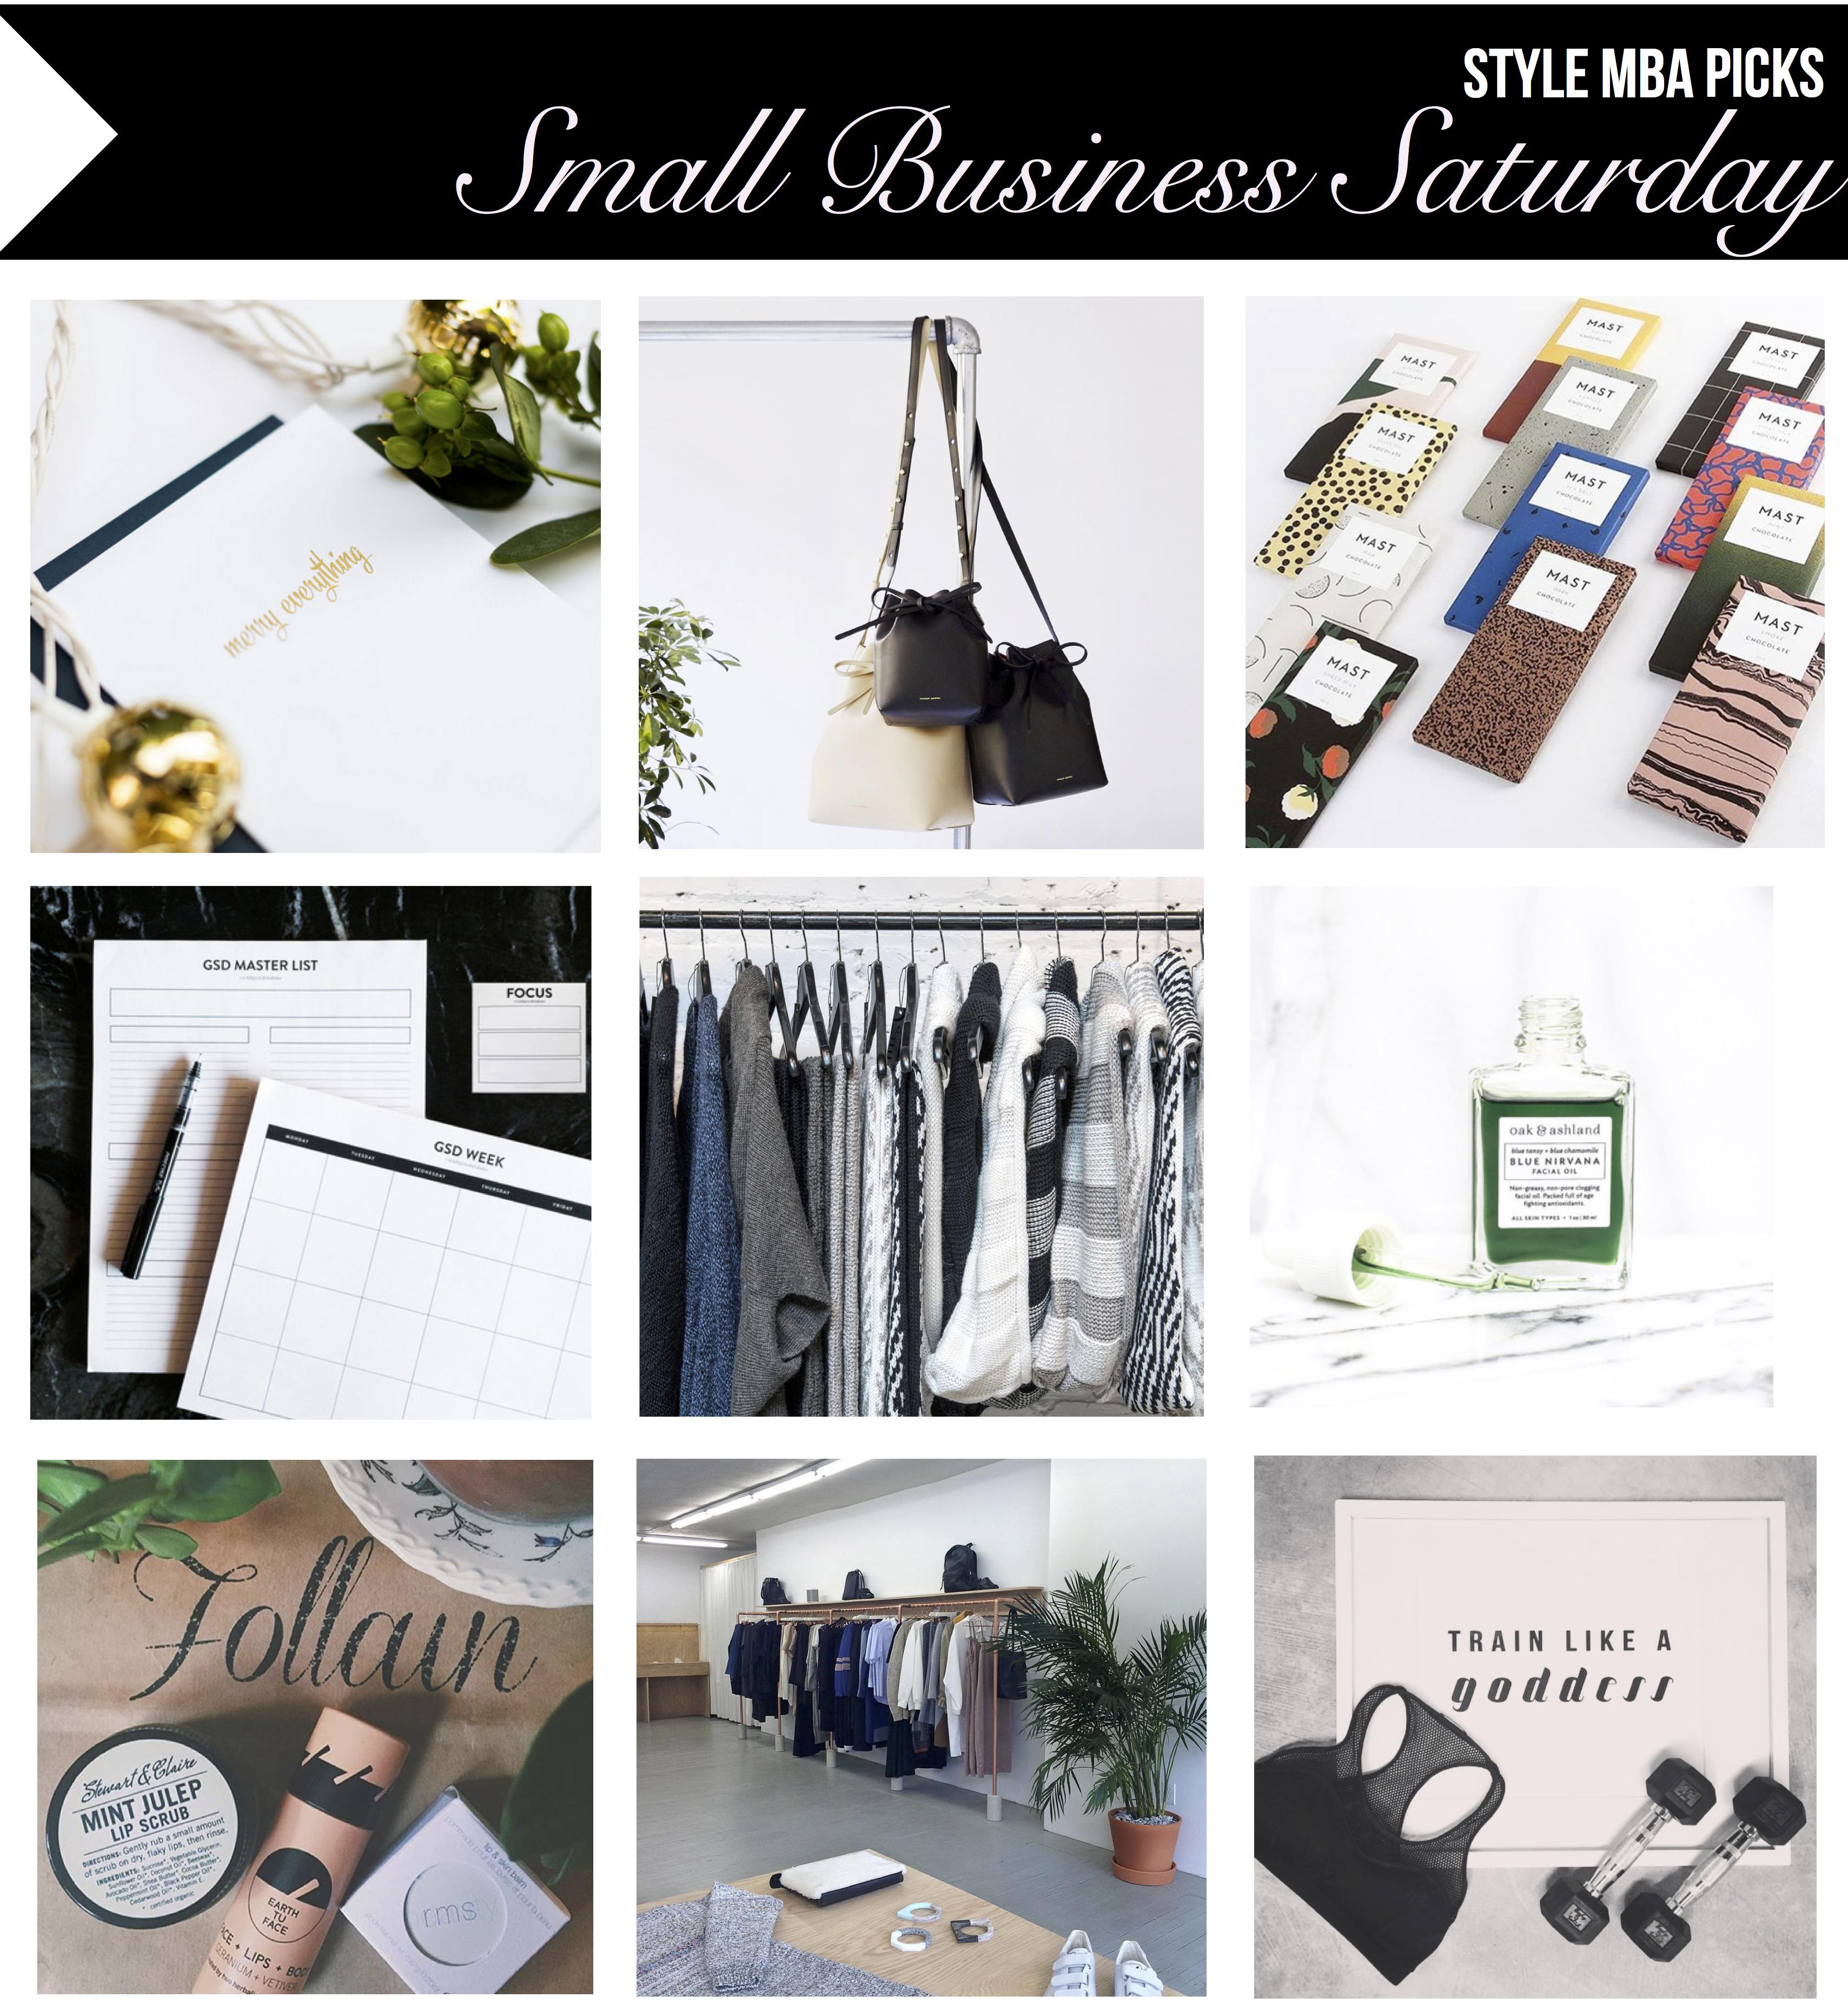 Small Shop image